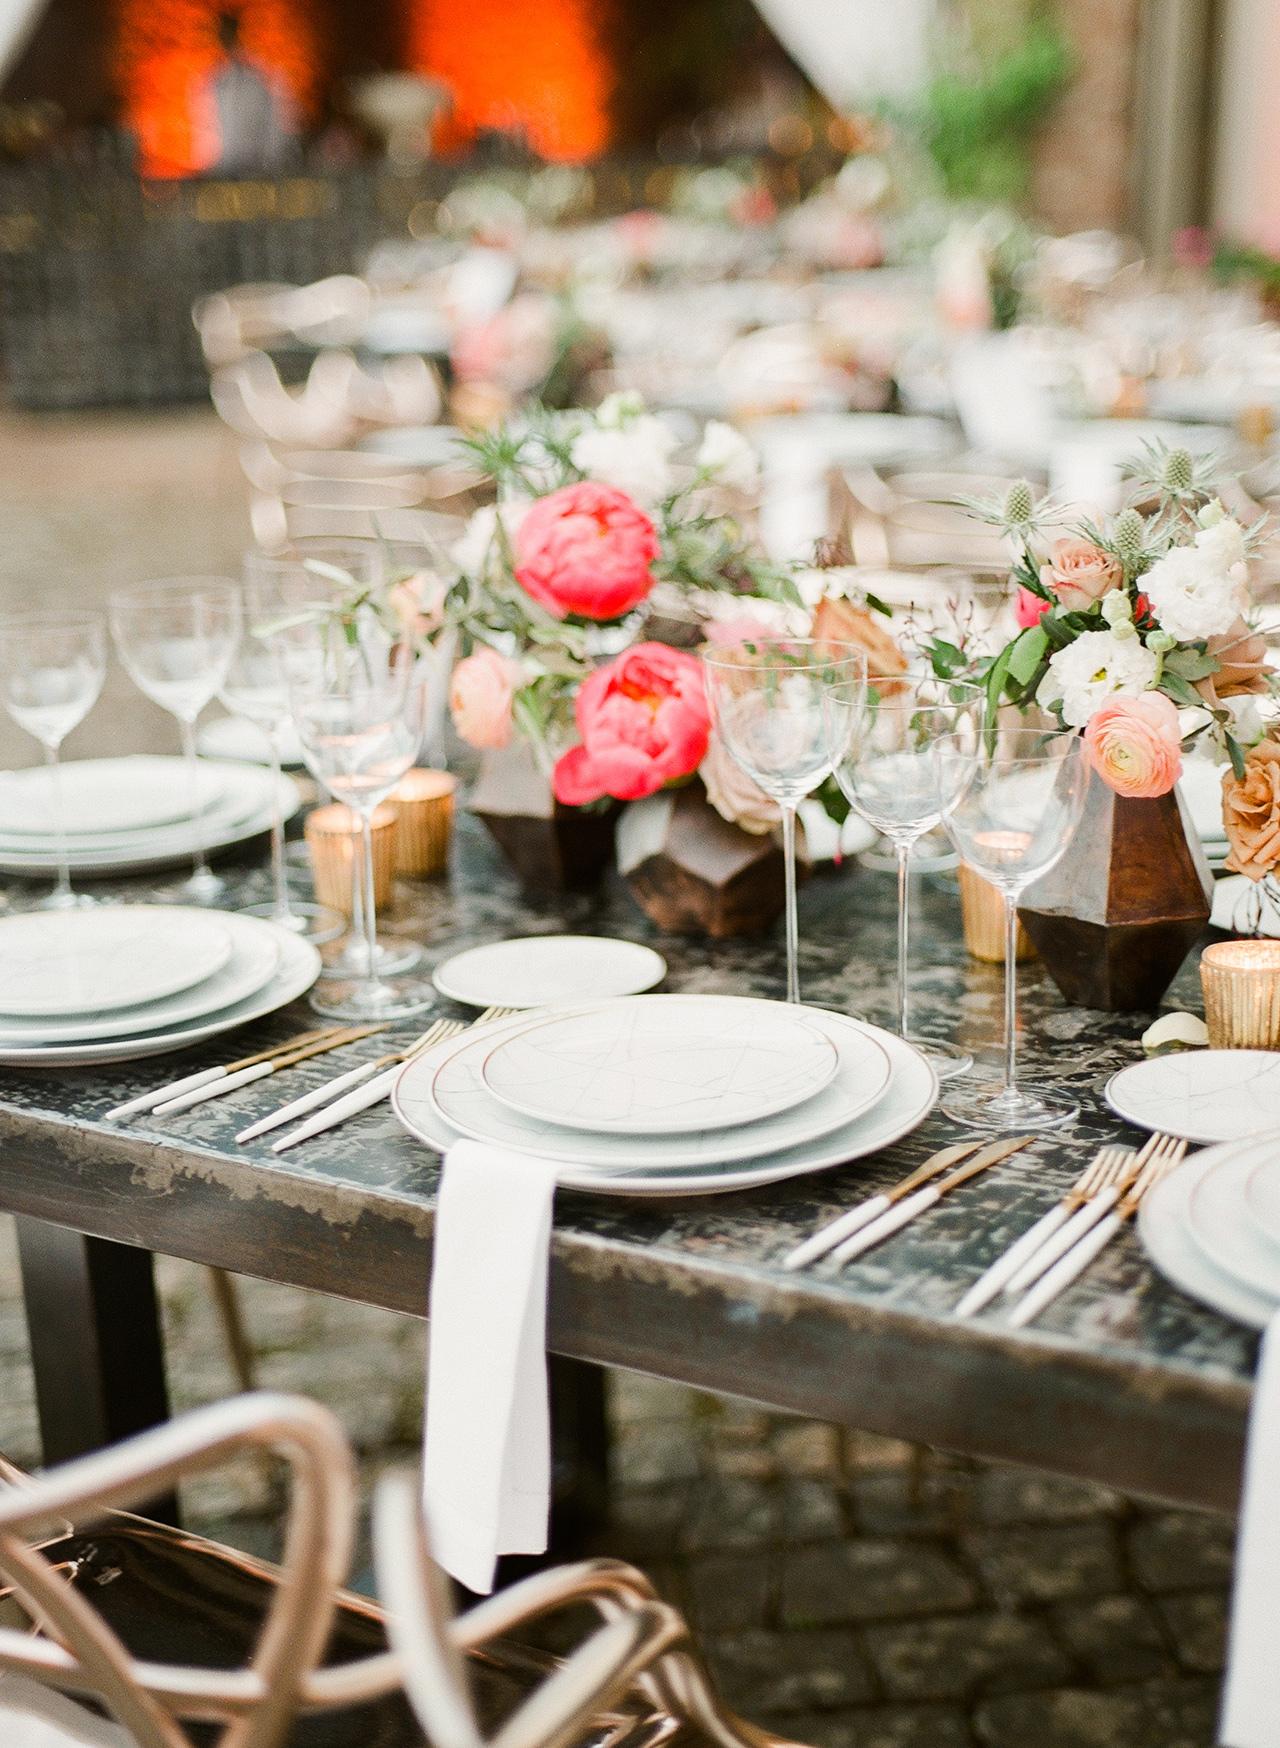 floral table setting arrangement rustic wooden tables